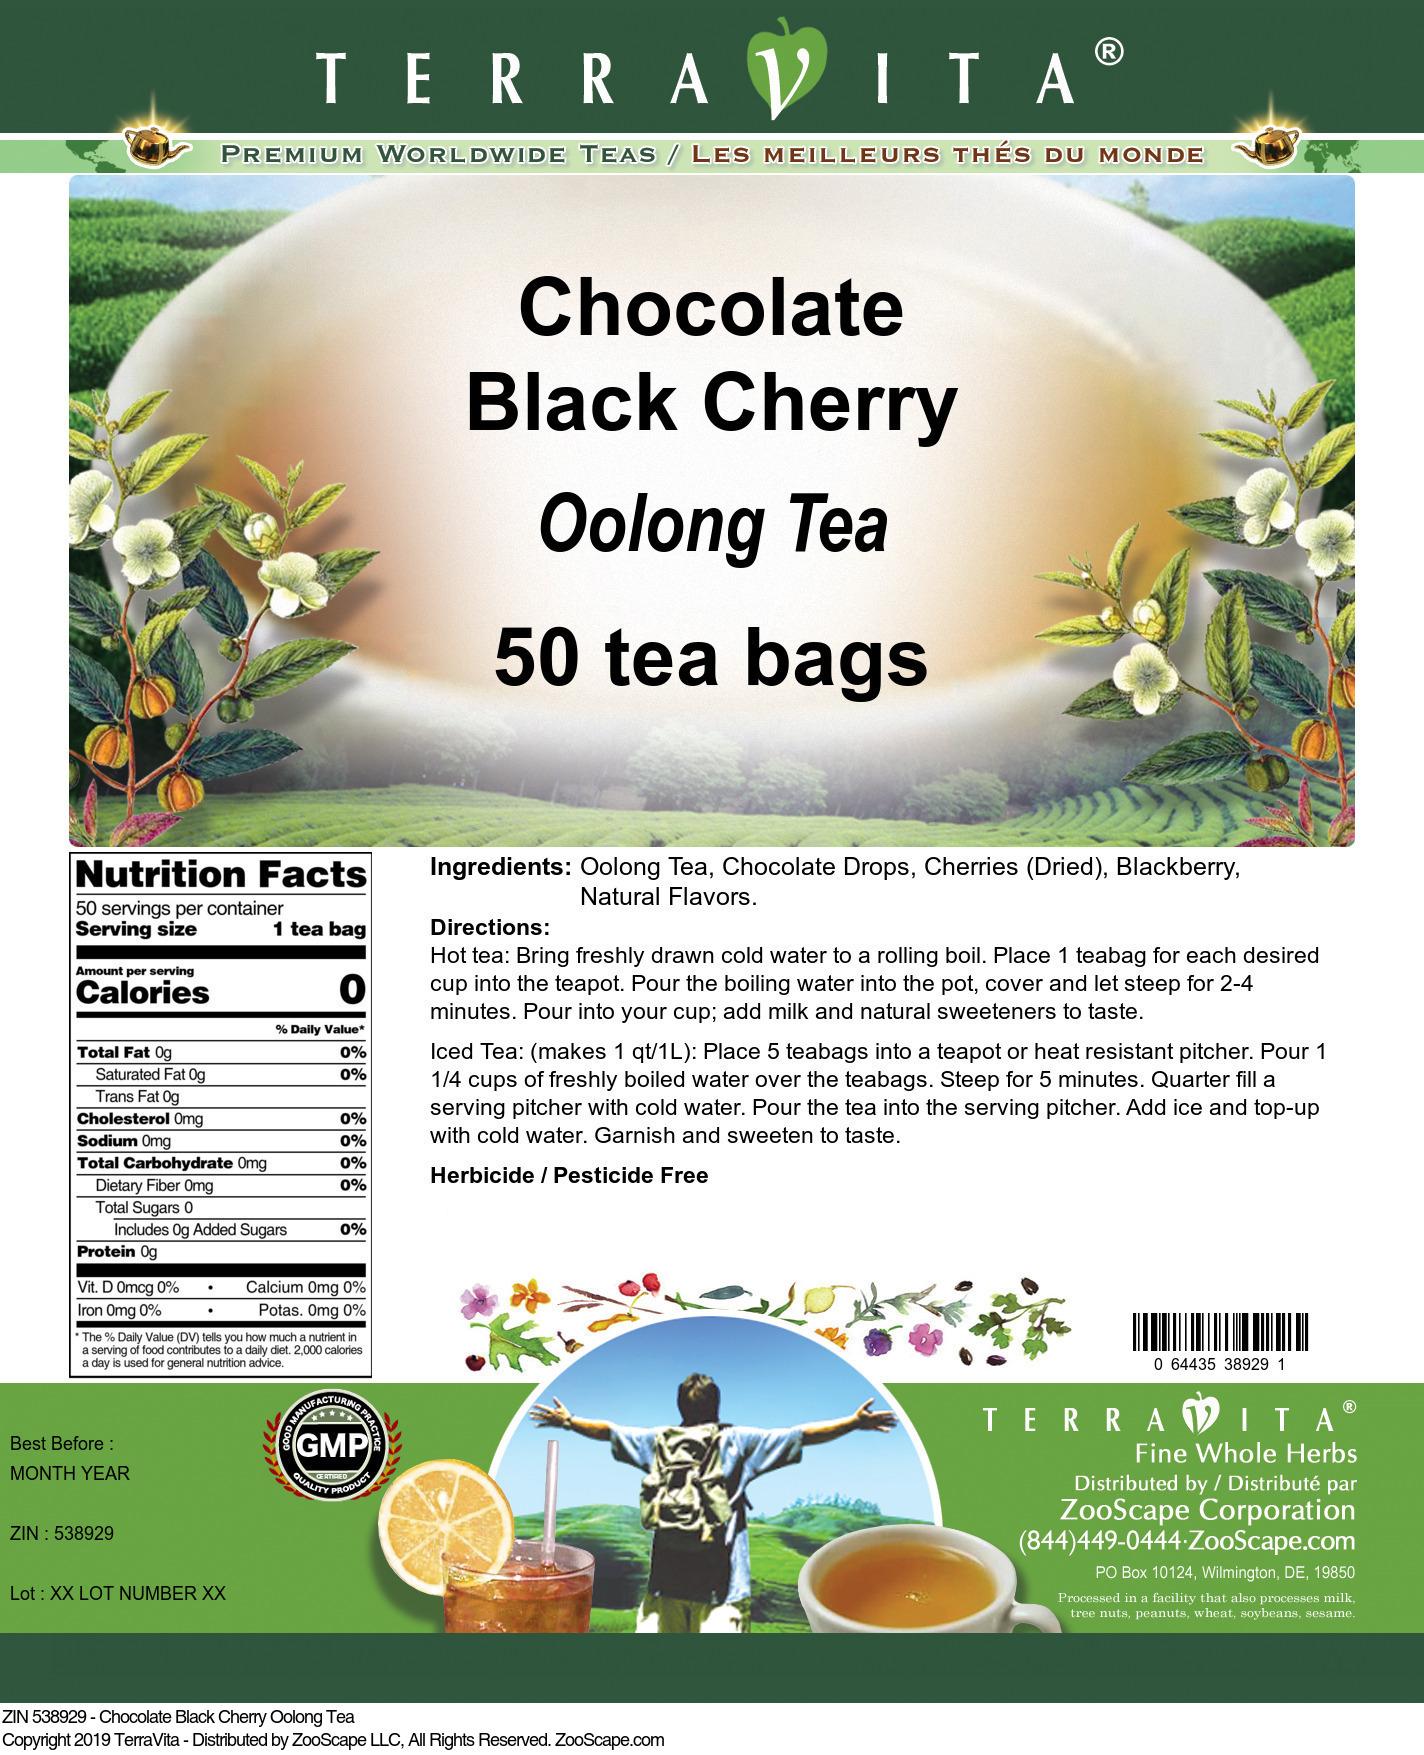 Chocolate Black Cherry Oolong Tea